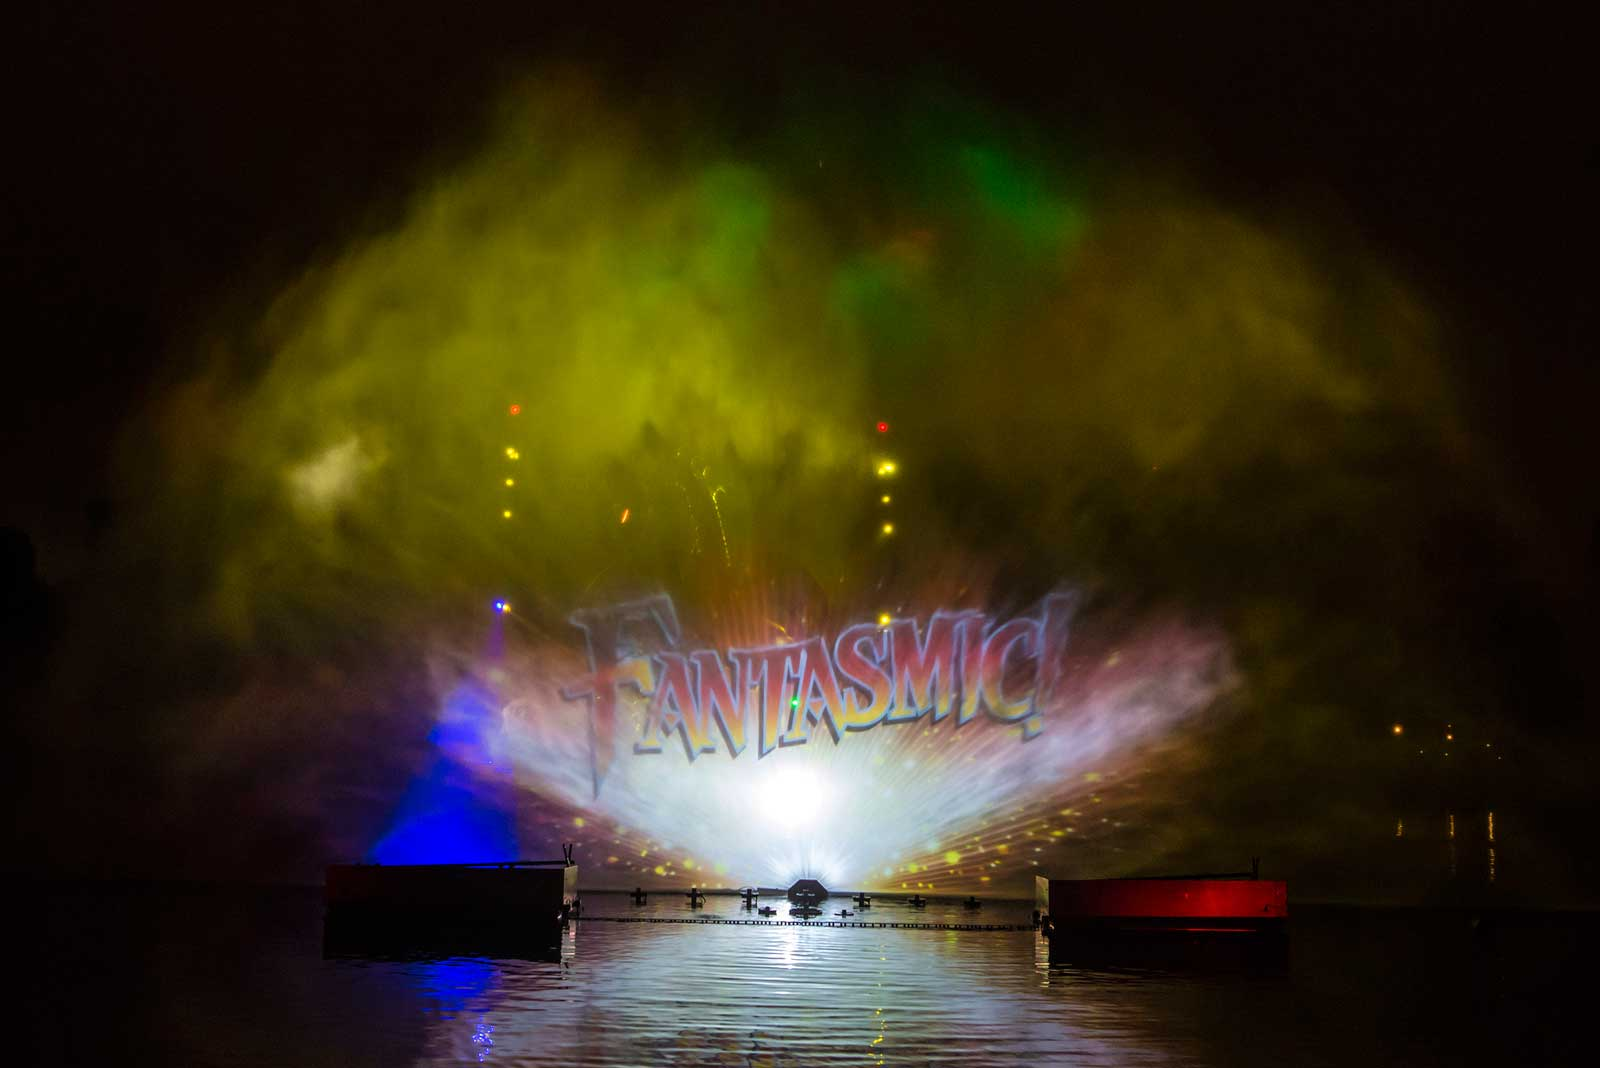 Fantasmic! Returns to Disneyland with New Scenes and